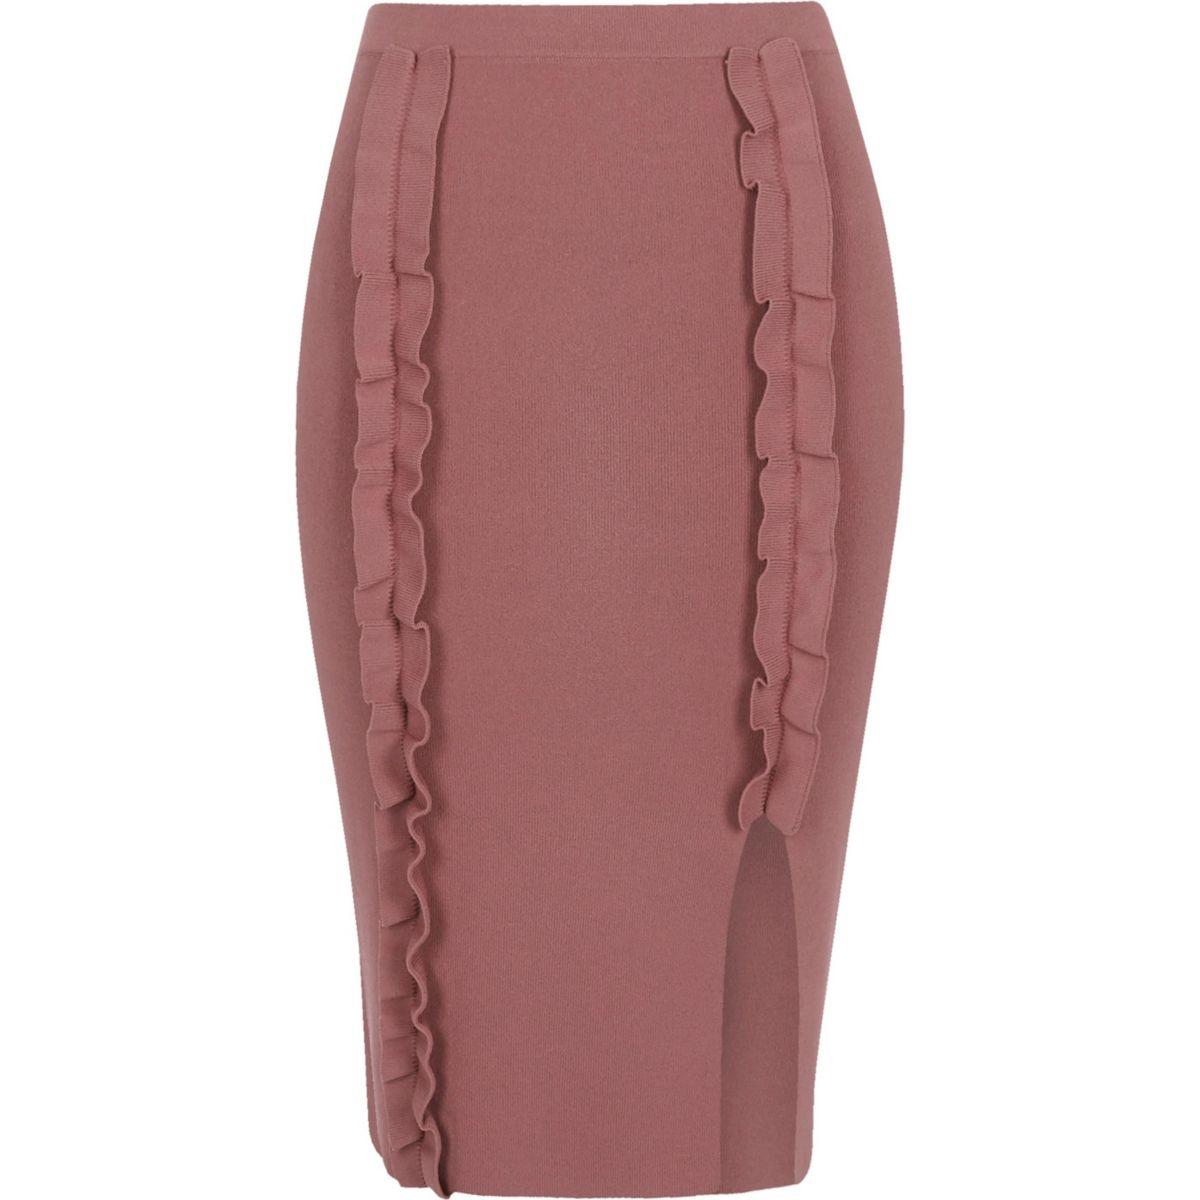 Dark pink ruffle knit bodycon midi skirt